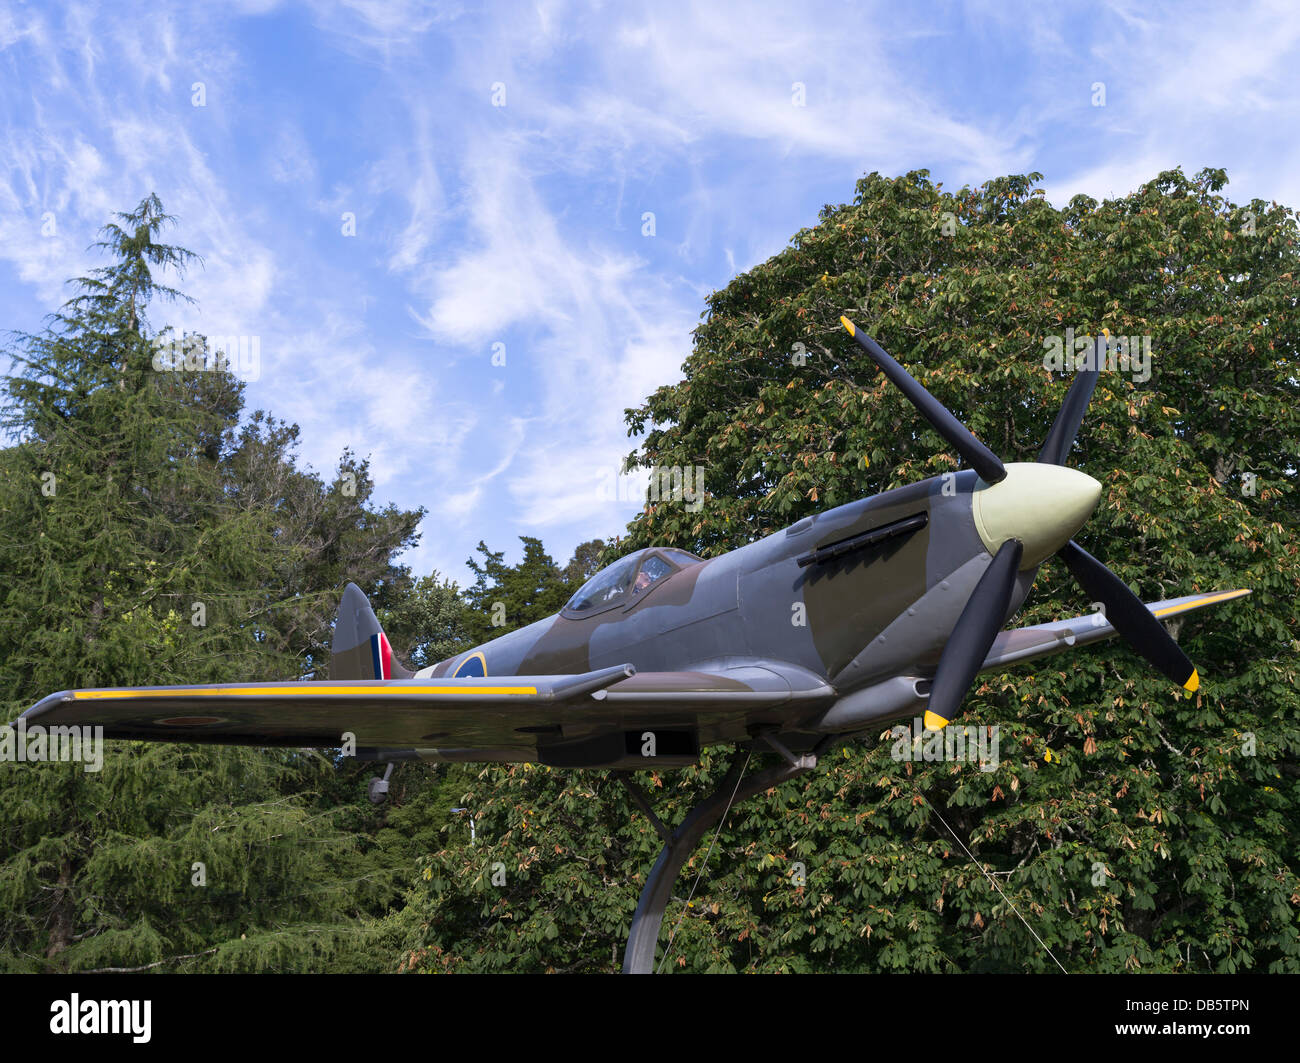 dh Memorial Park HAMILTON NEW ZEALAND Spitfire mk xvi replica aeroplane ww2 fighter plane aircraft world war two - Stock Image